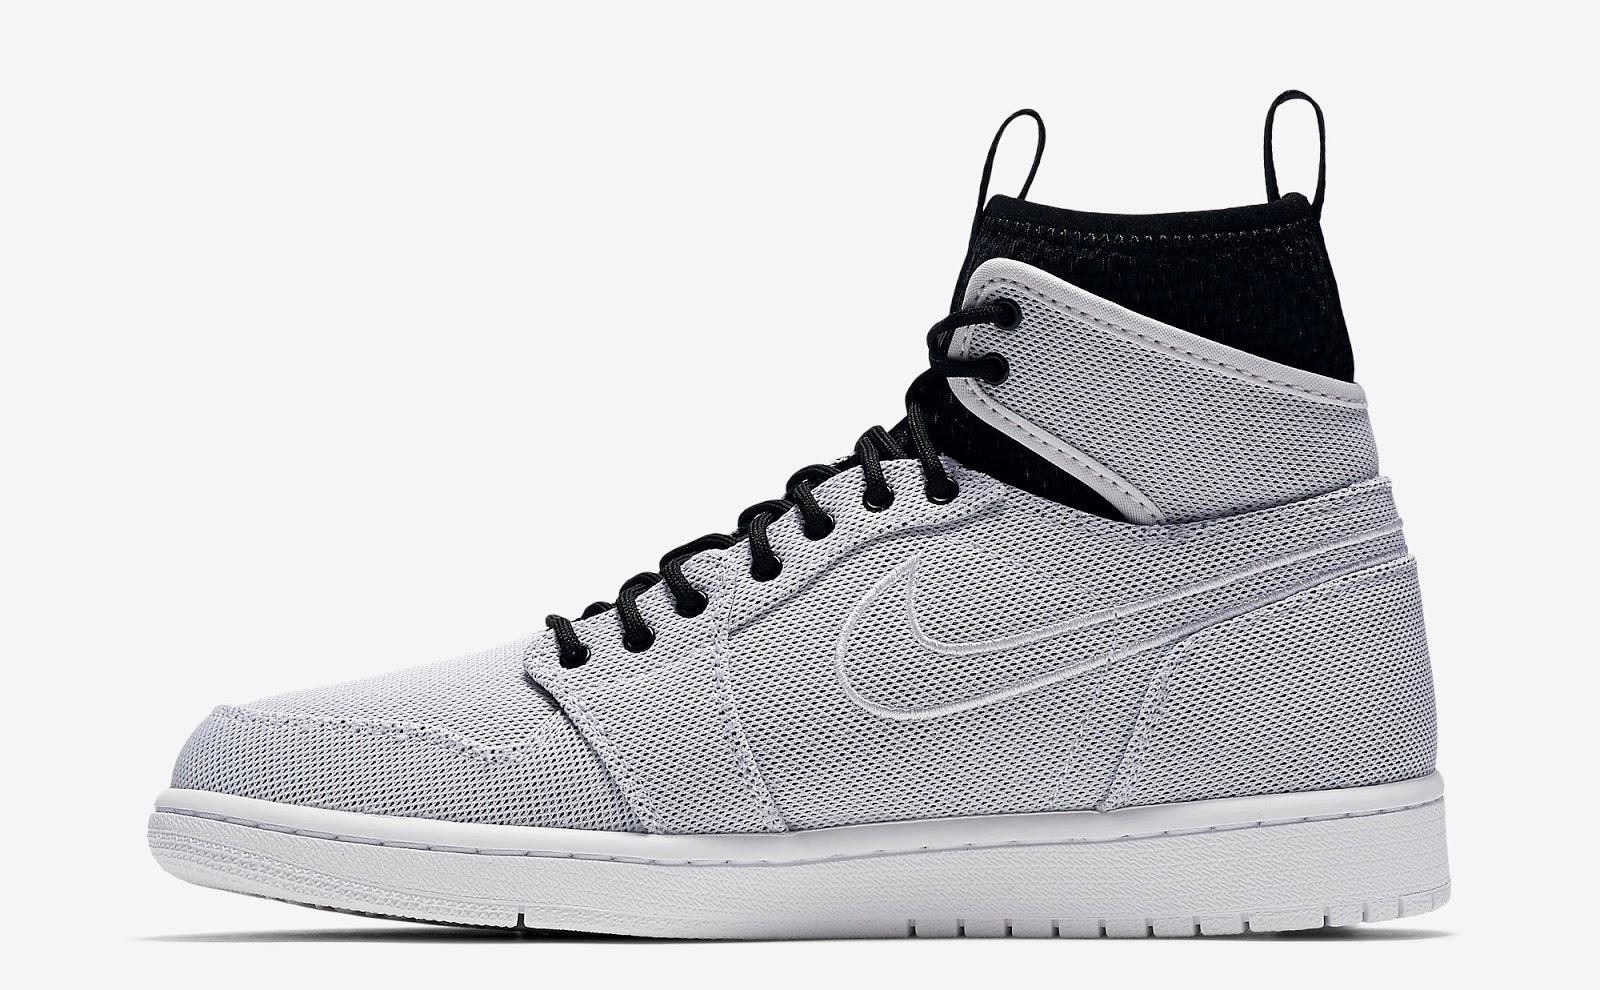 competitive price 78990 ec3e9 ajordanxi Your  1 Source For Sneaker Release Dates  Air Jordan 1 Retro  Ultra High White Metallic Gold Coin-Black-Pure Platinum Release Reminder